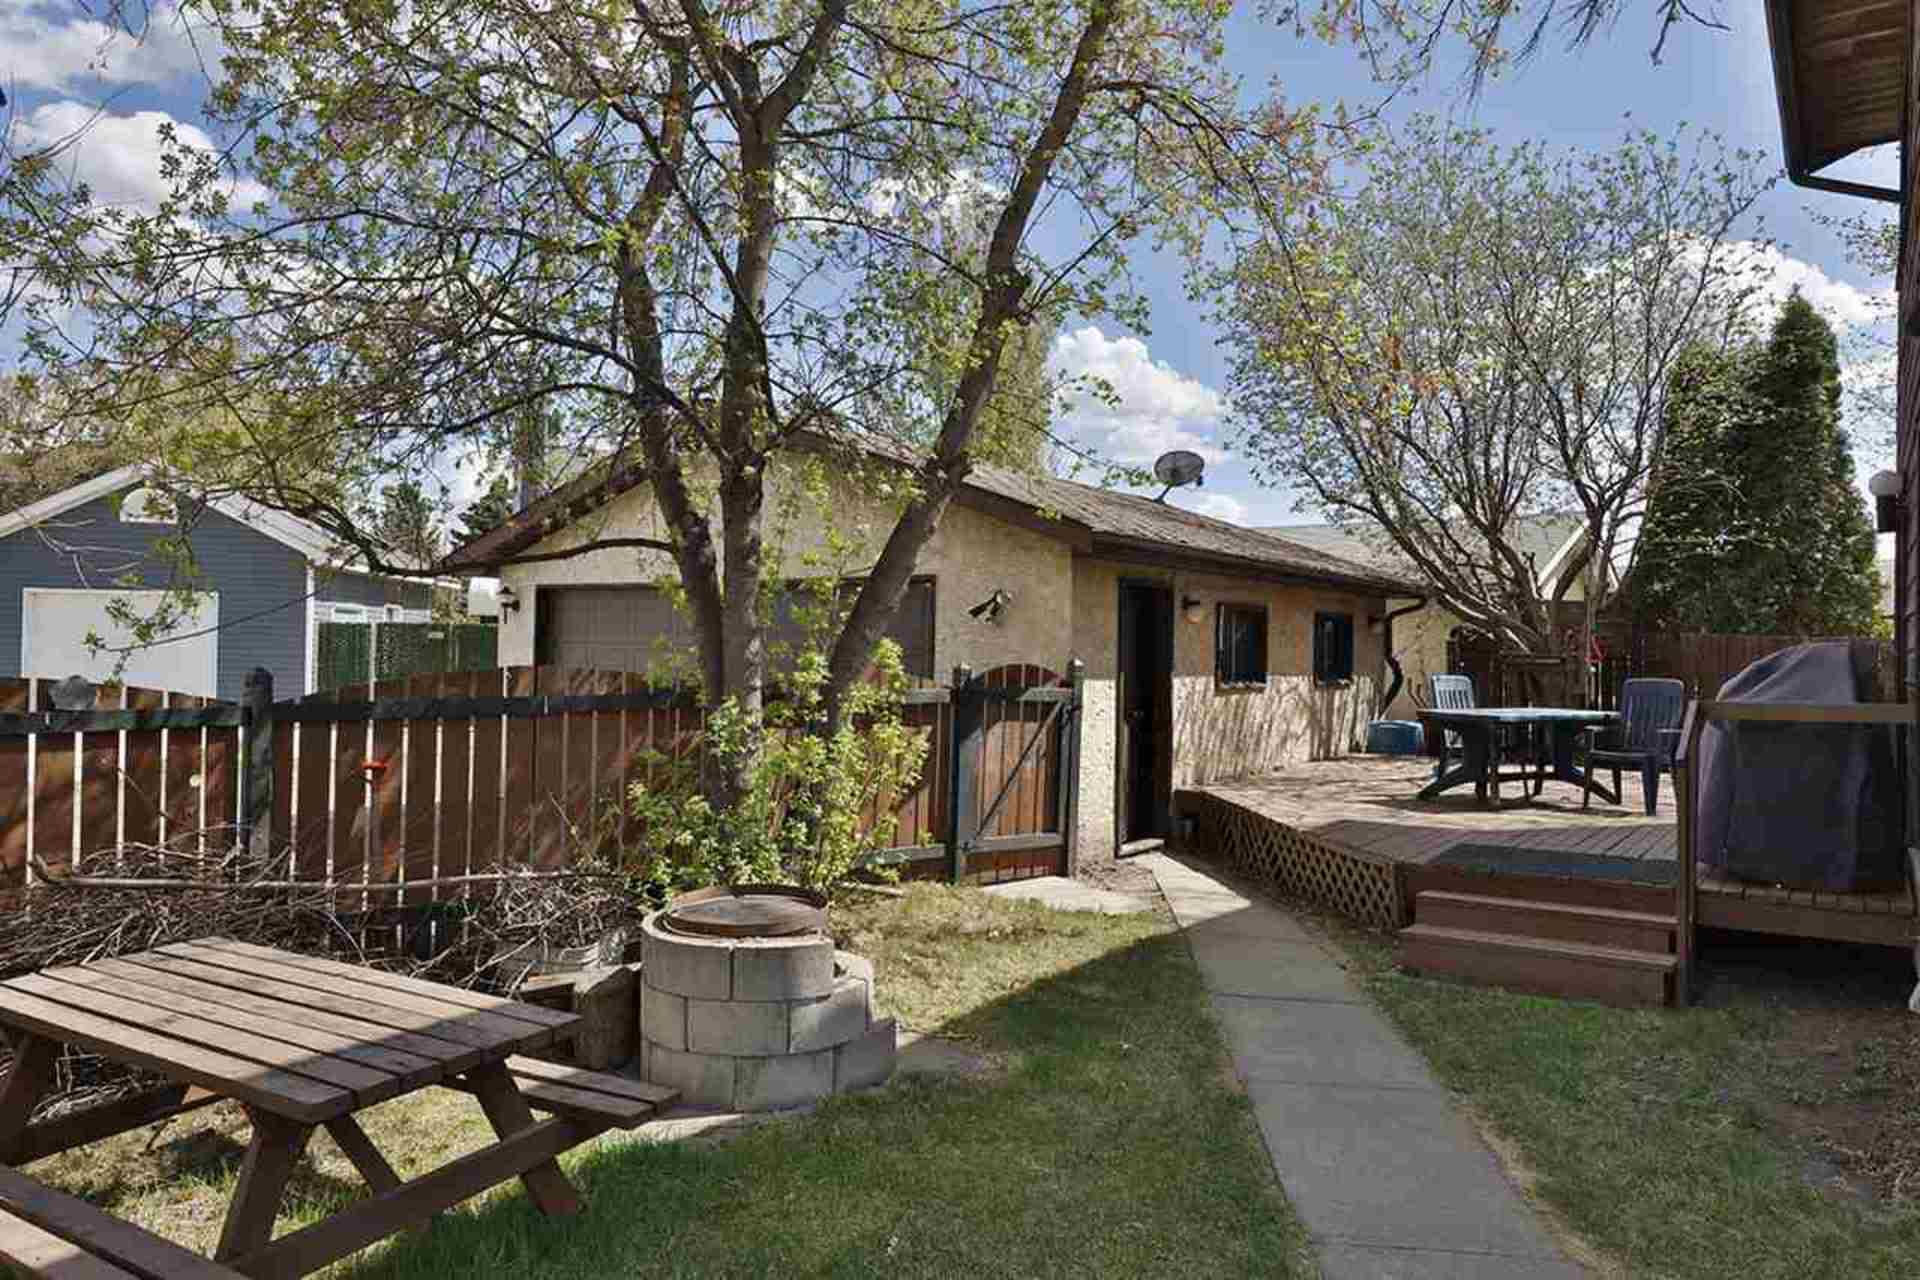 14111-117-street-carlisle-edmonton-18 at 14111 117 Street, Carlisle, Edmonton